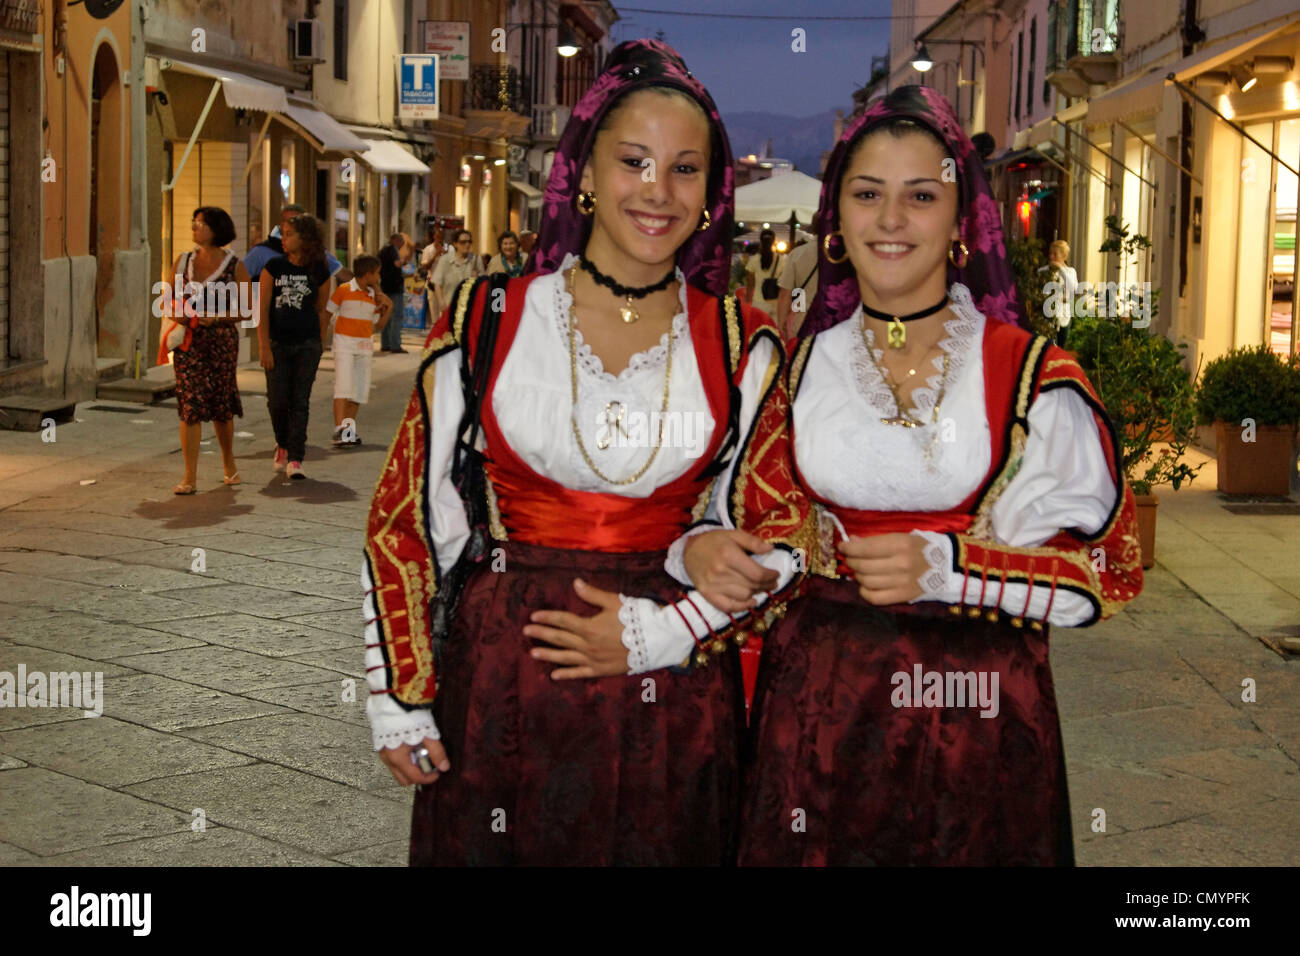 Italy Sardinia Olbia, women with traditional costumes on main street - Stock Image